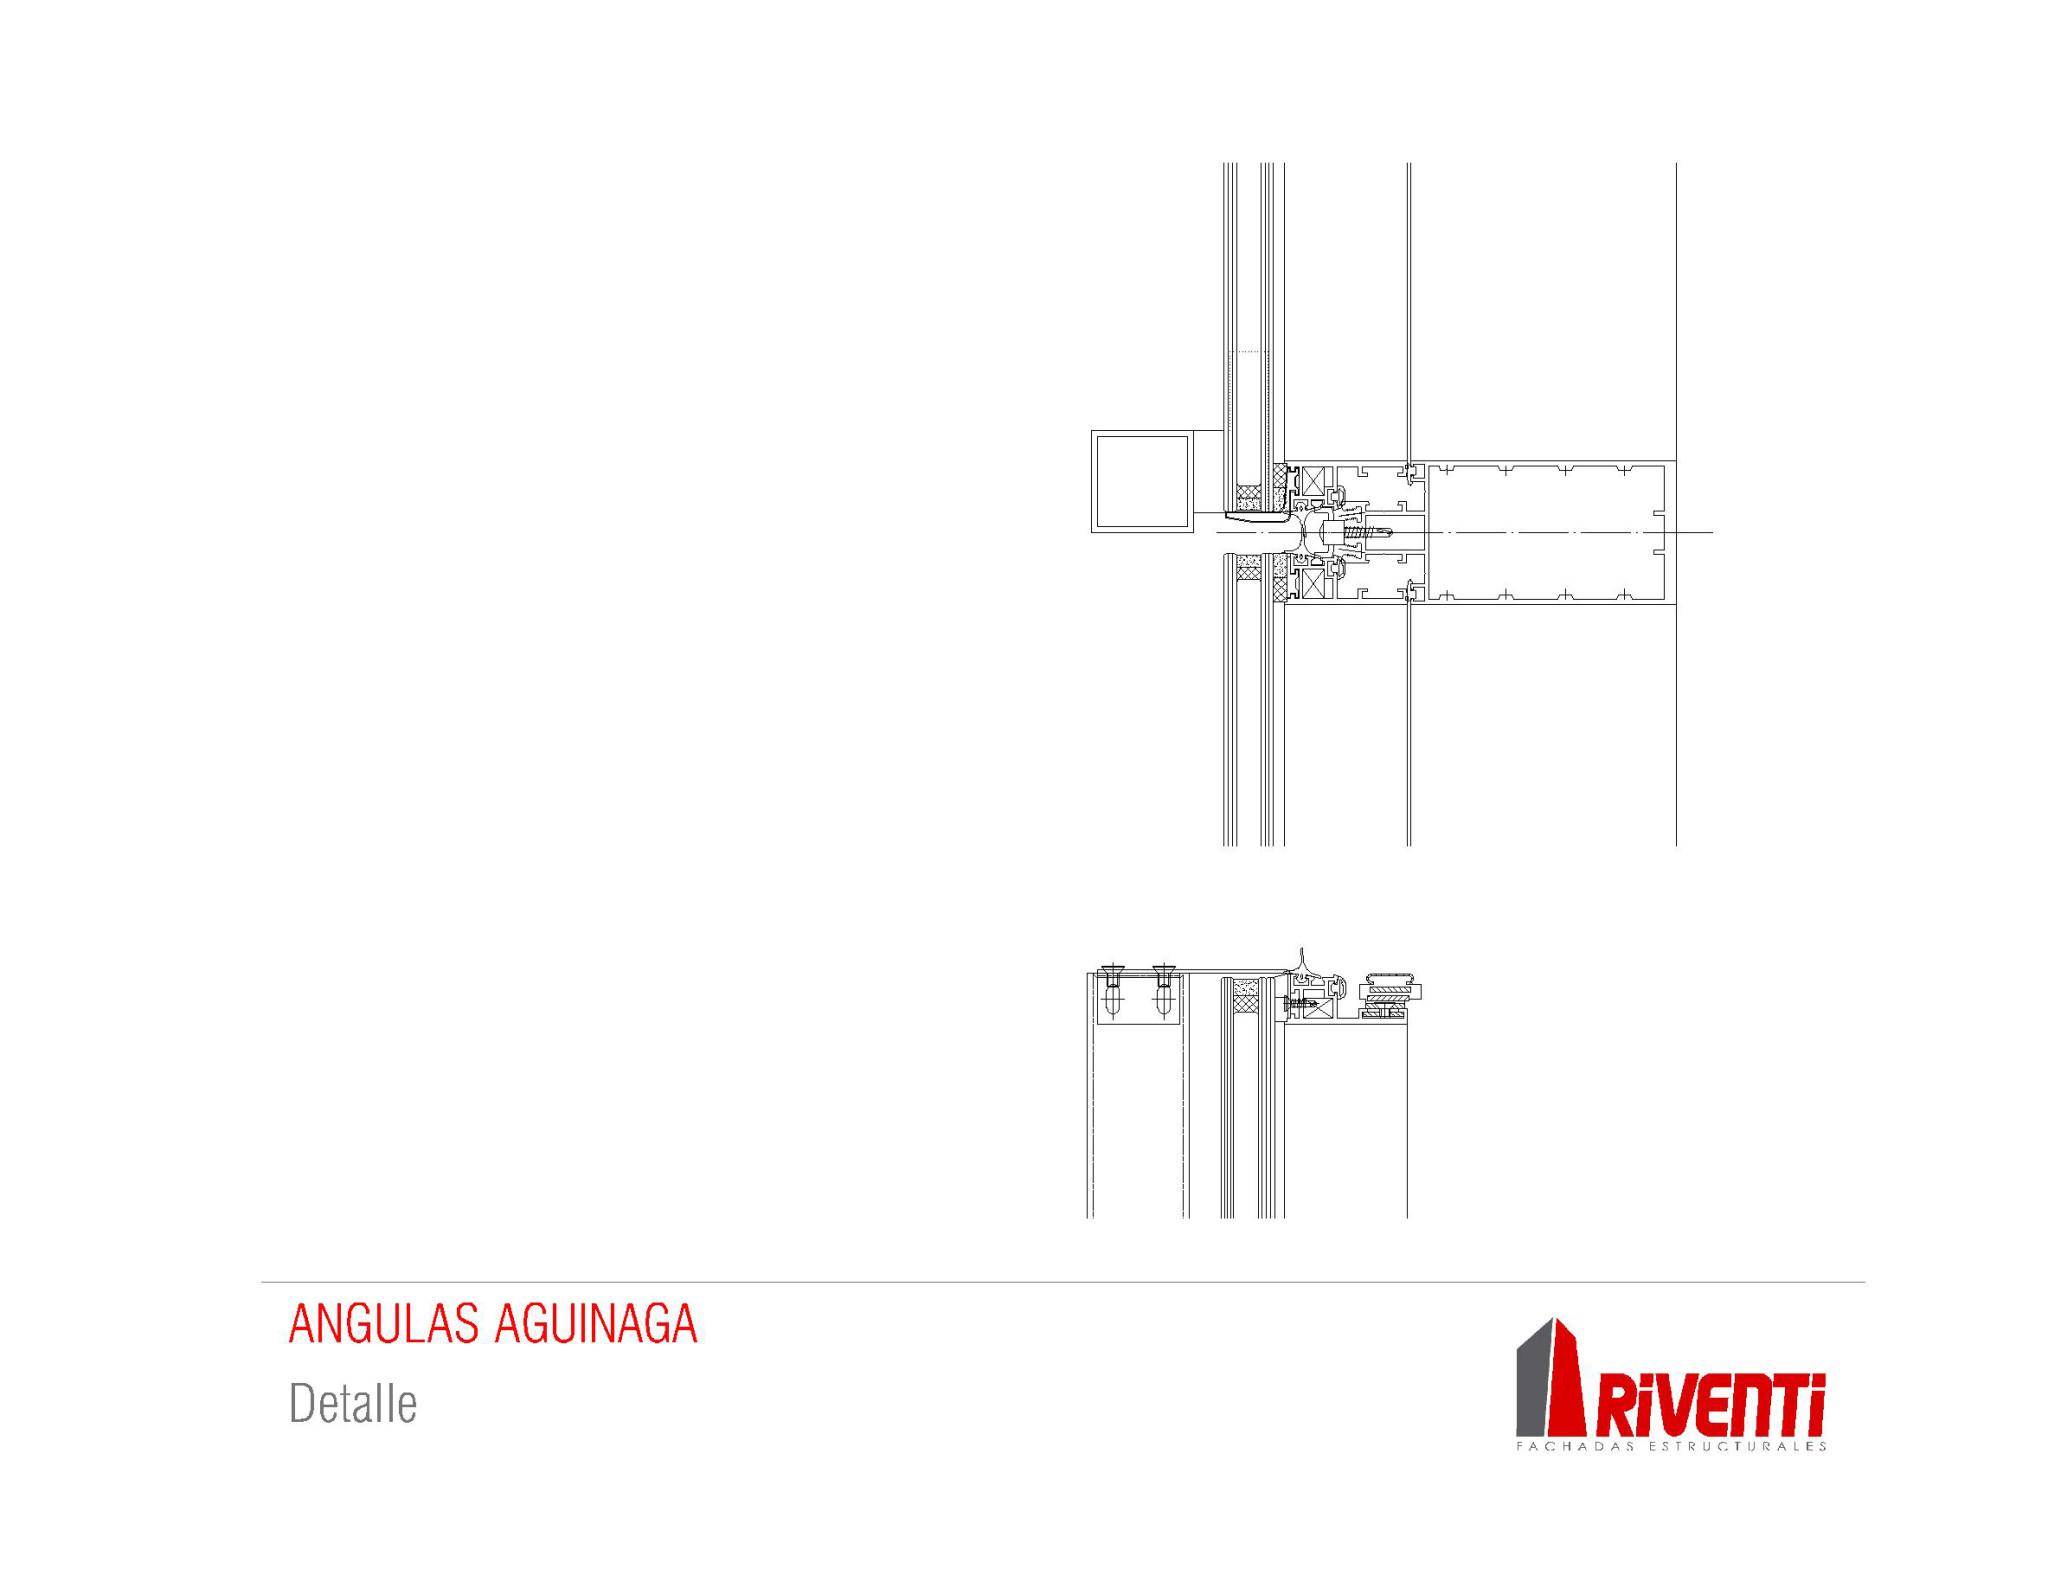 R-84_ANGULAS AGUINAGA-Detalle lama